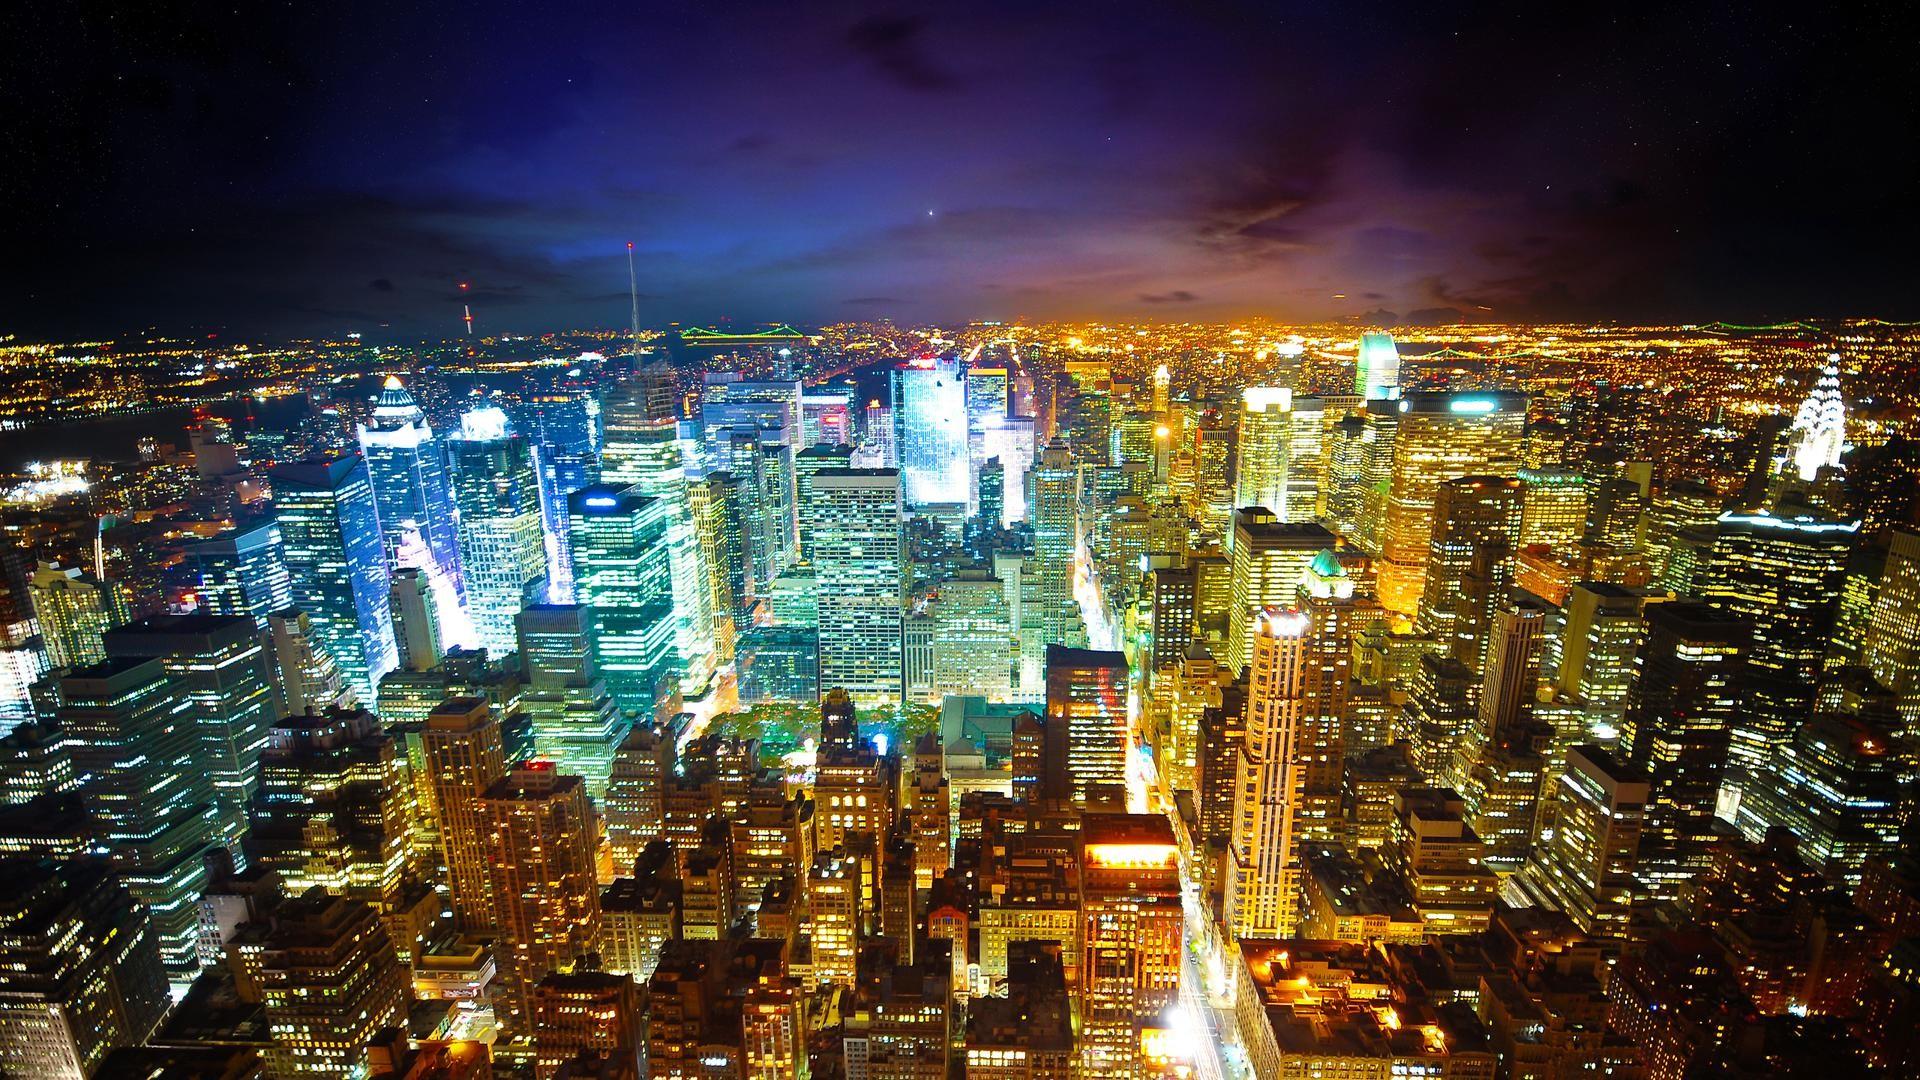 Hd Wallpaperwallpaper New York Yankees Wallpaper: New York City At Night  Widescreen Hd Wallpaper Pocketyguyscom